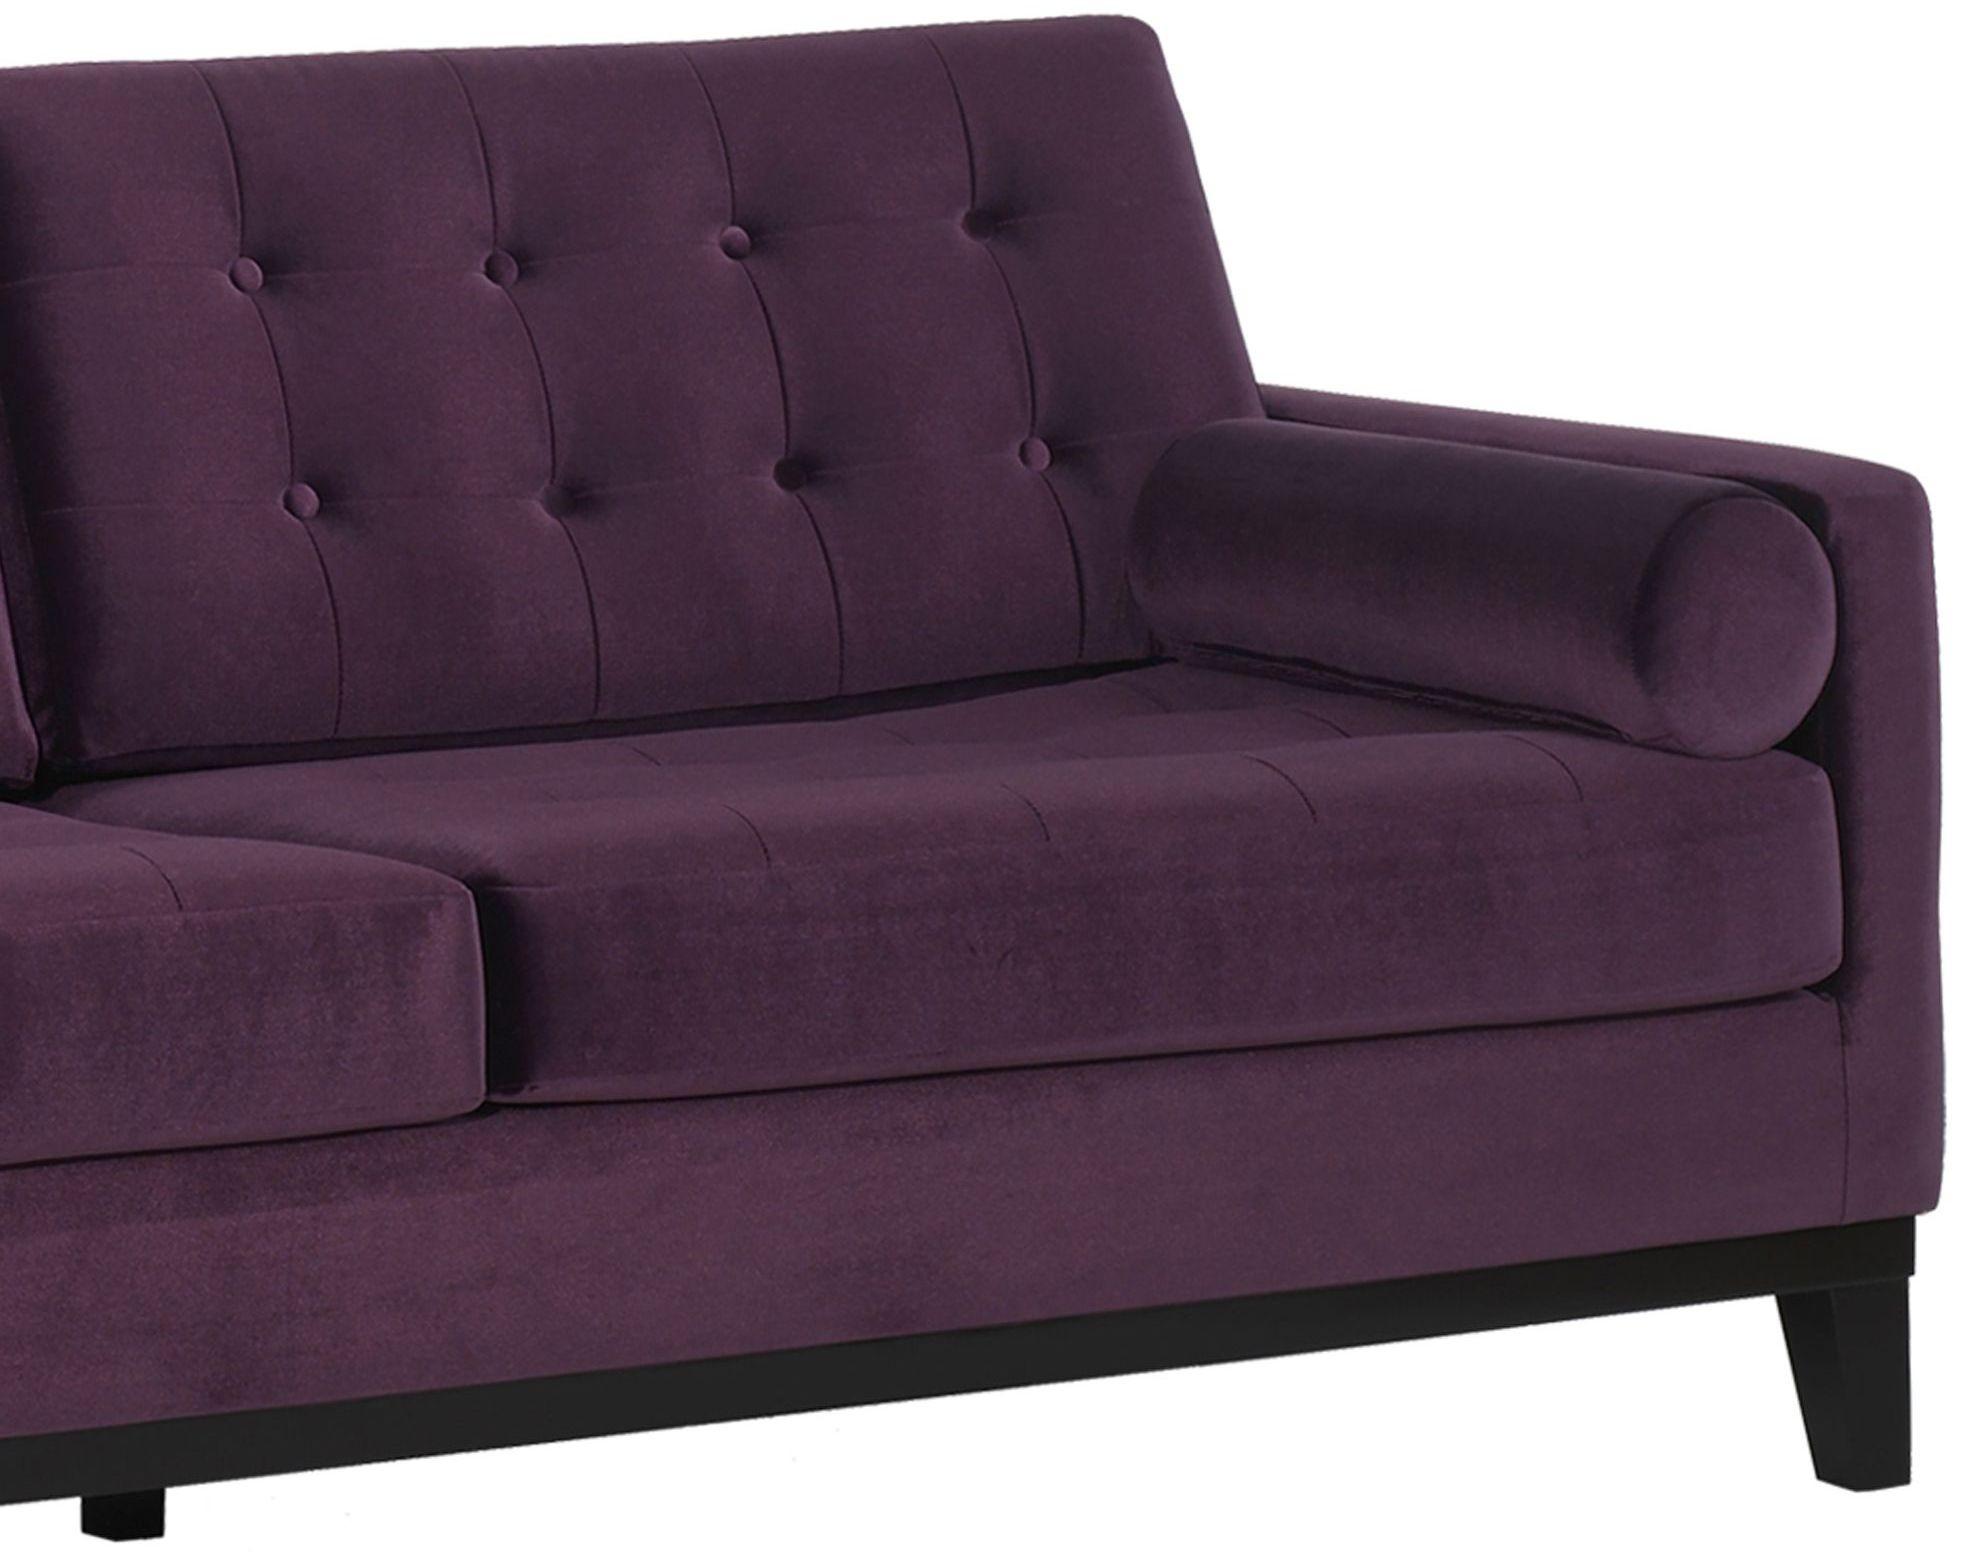 Centennial Purple Velvet Sofa Lc7253pu Armen Living